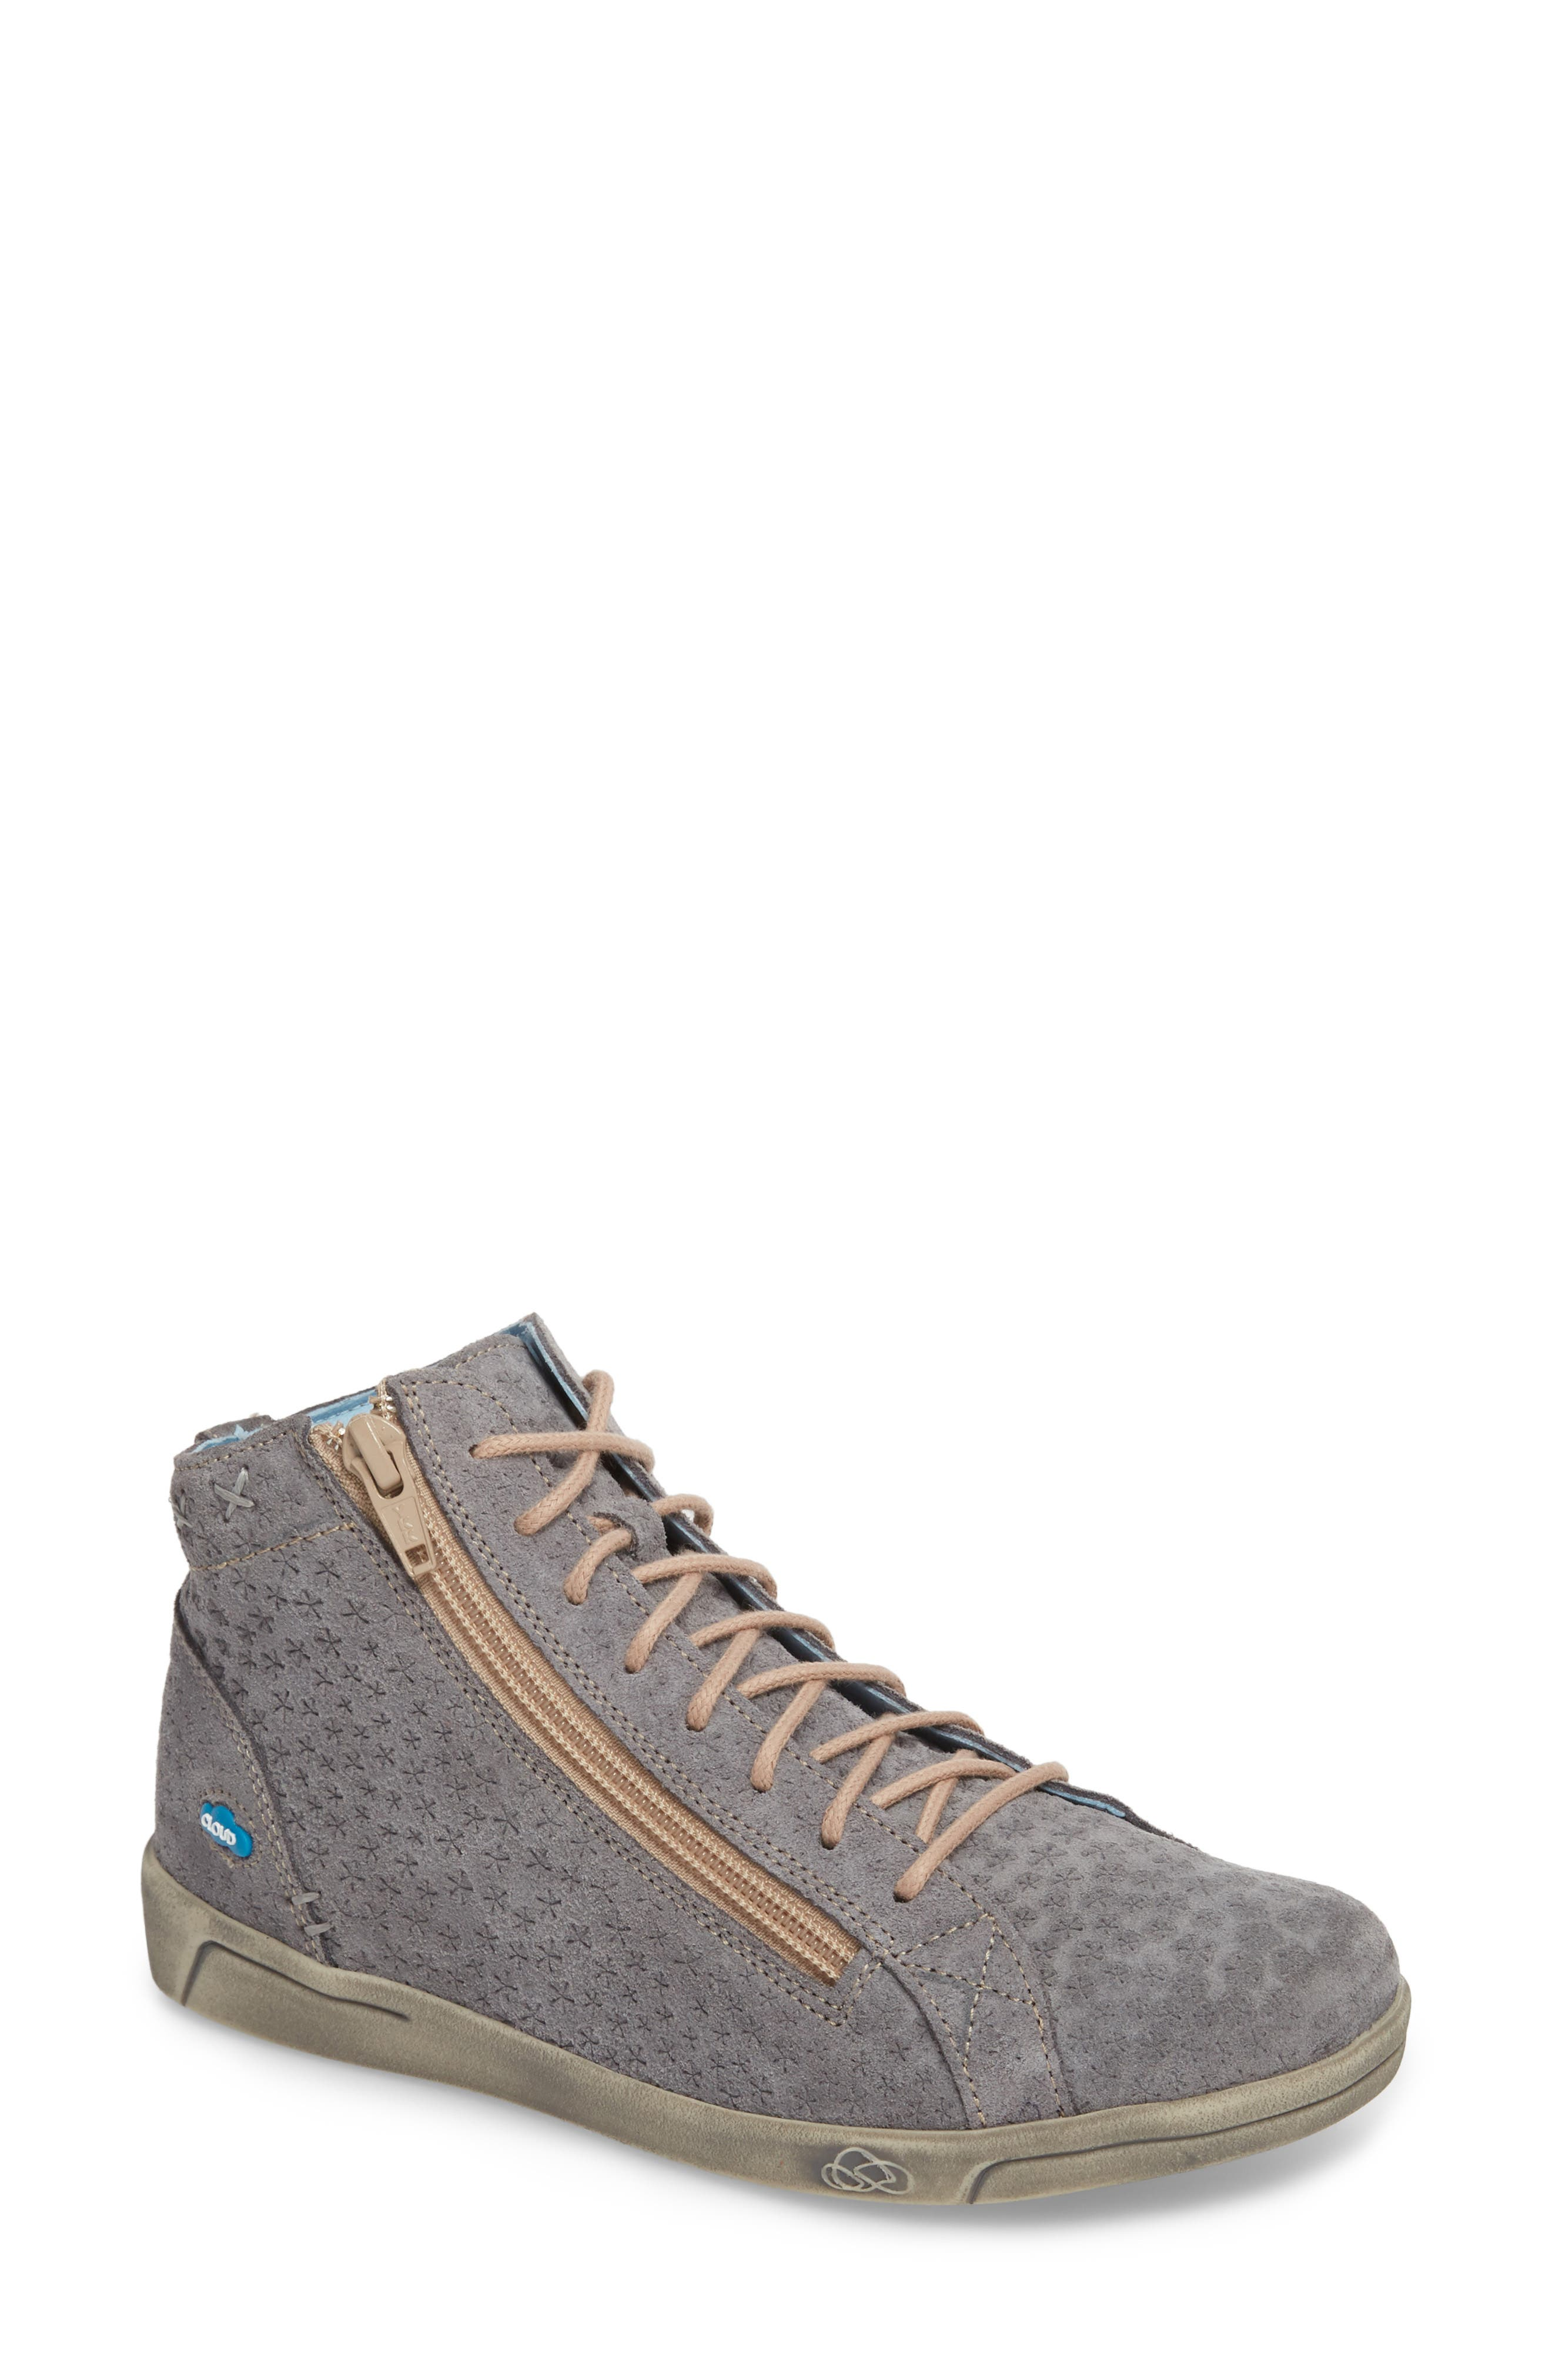 CLOUD Aika Star Perforated High Top Sneaker (Women)